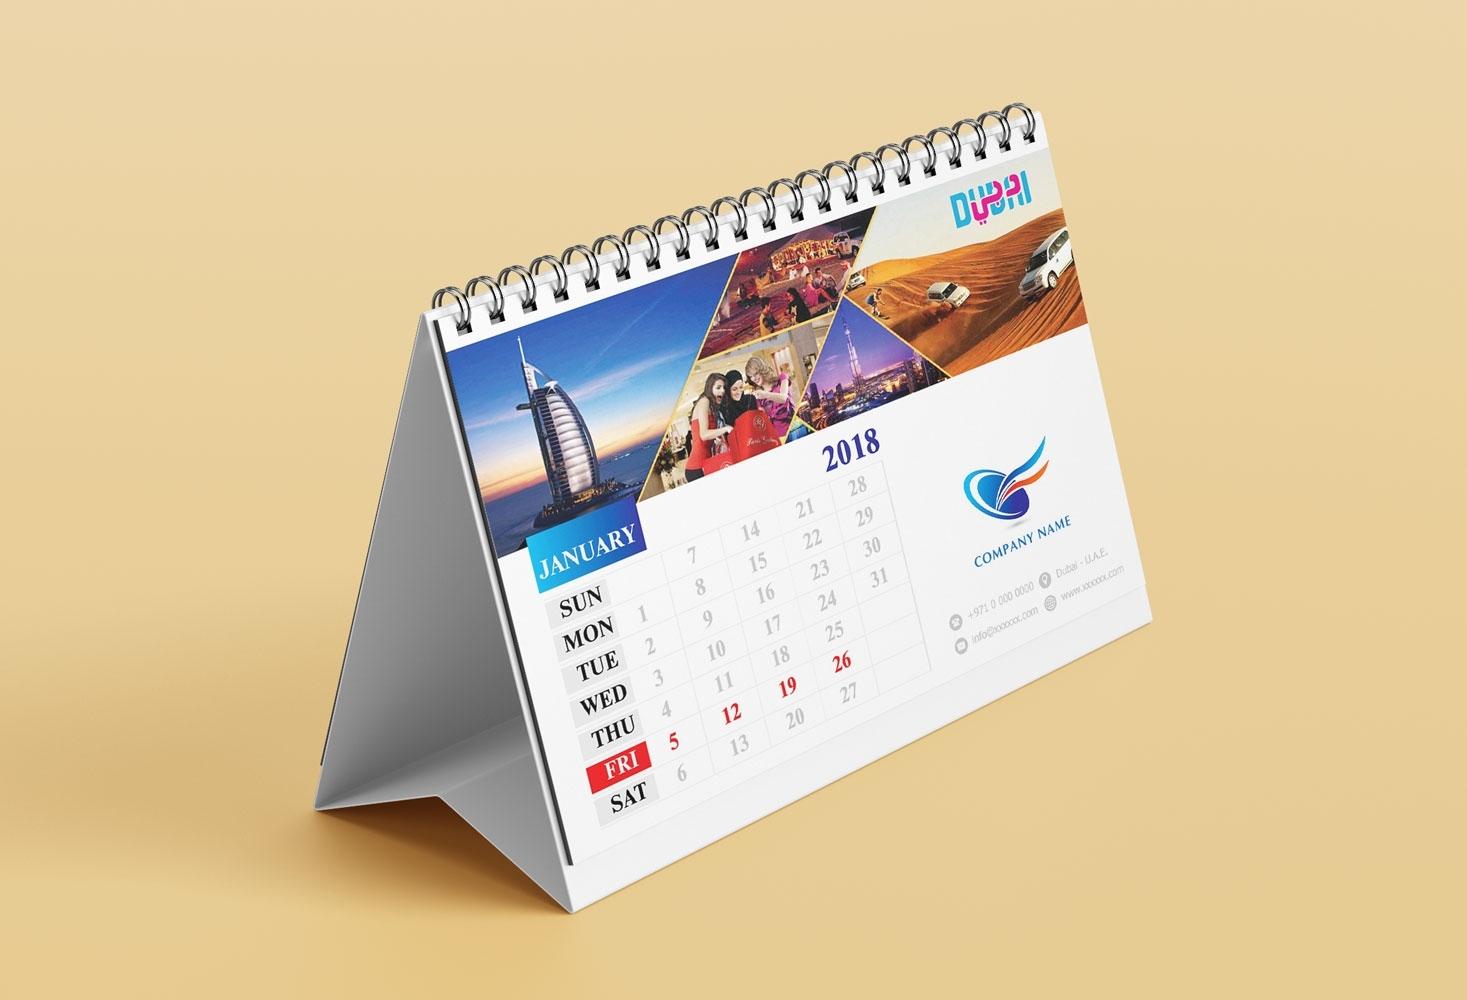 Calendars Printing In Dubai, Abu Dhabi The Calendar Printing Company